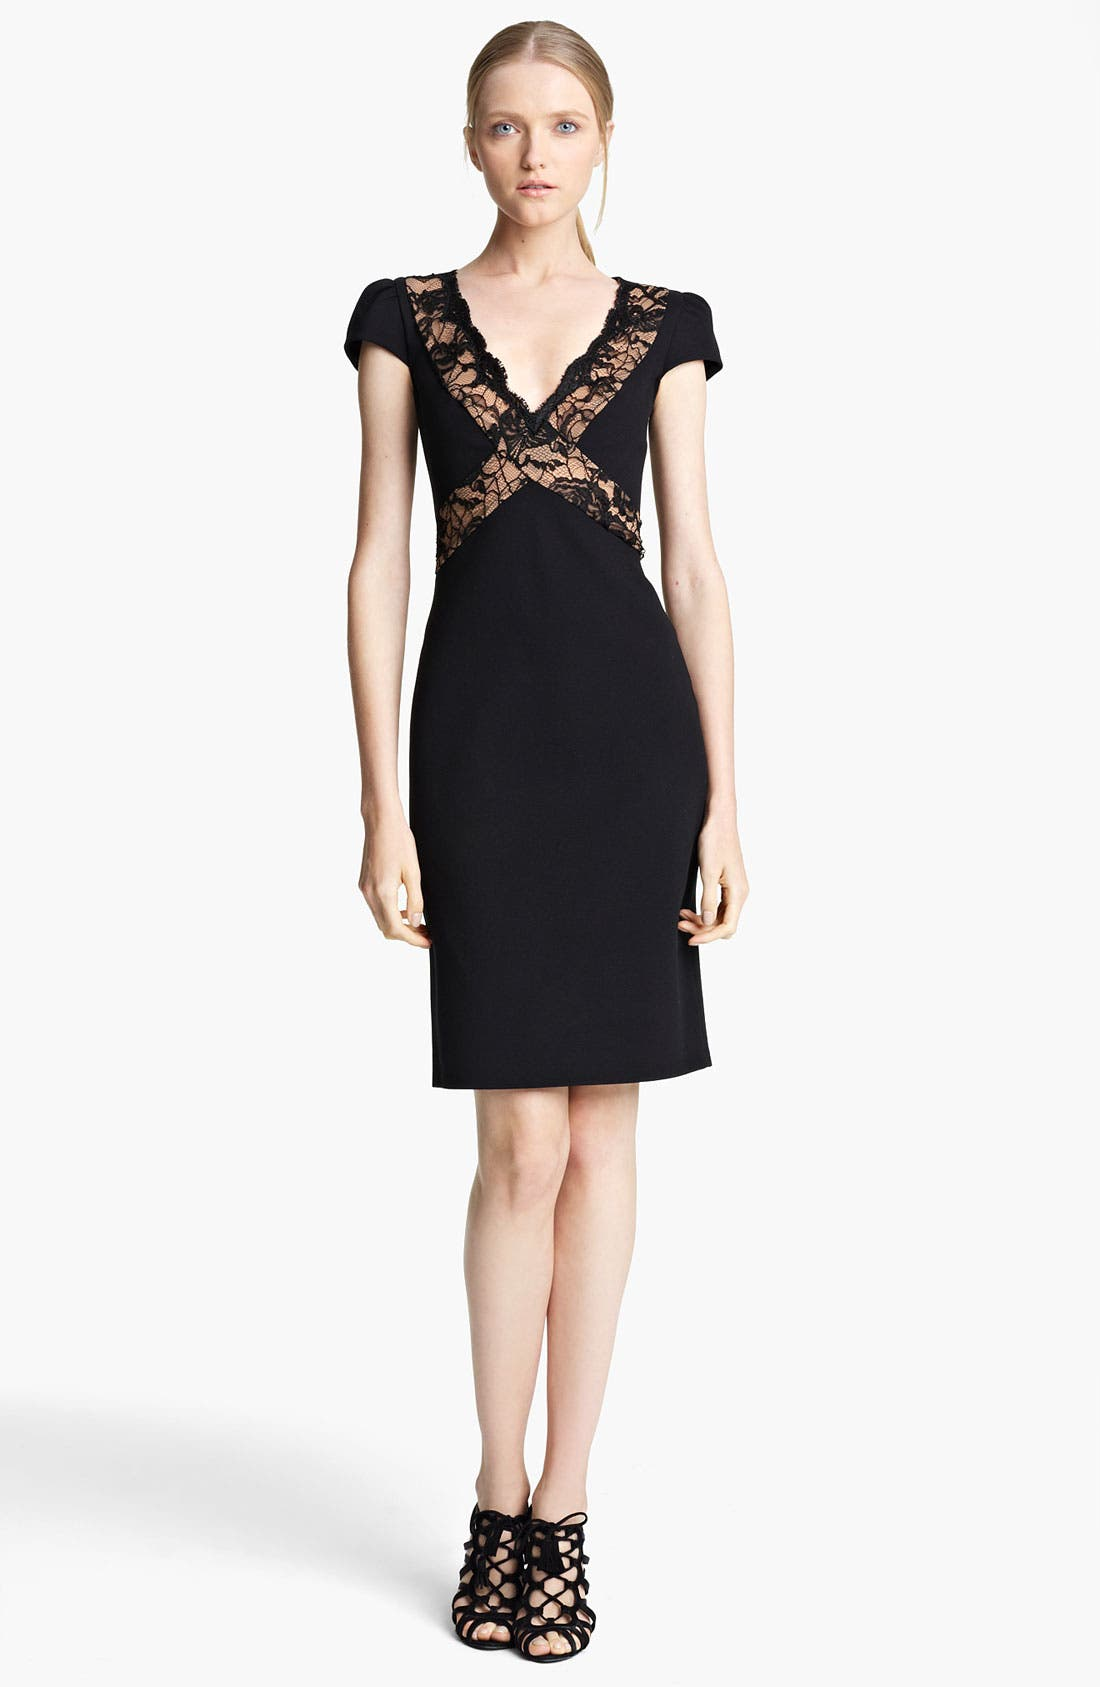 Alternate Image 1 Selected - Emilio Pucci Crisscross Lace Punto Milano Dress